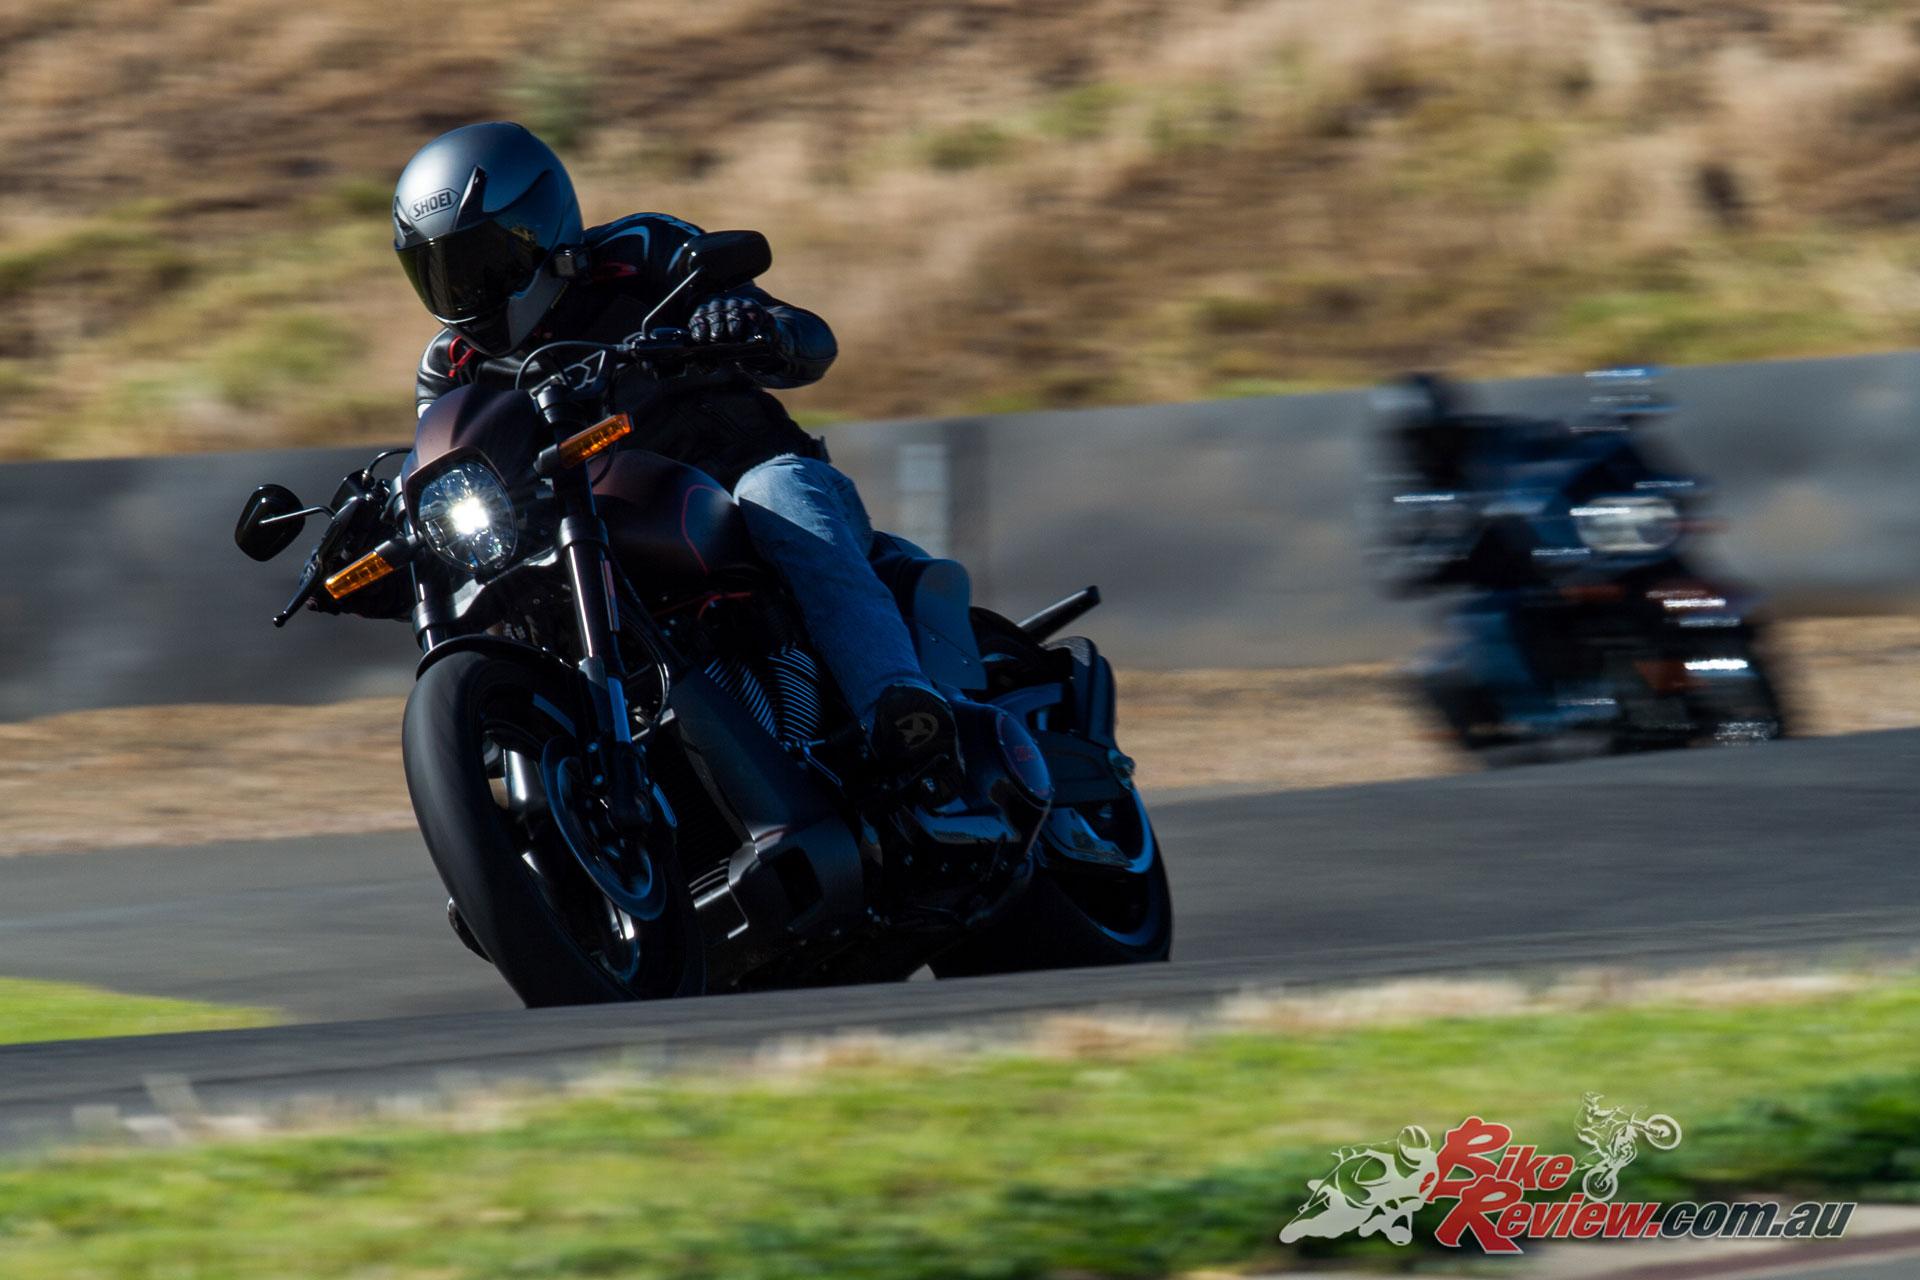 2019 Harley-Davidson Softail Tour - FXDR 114